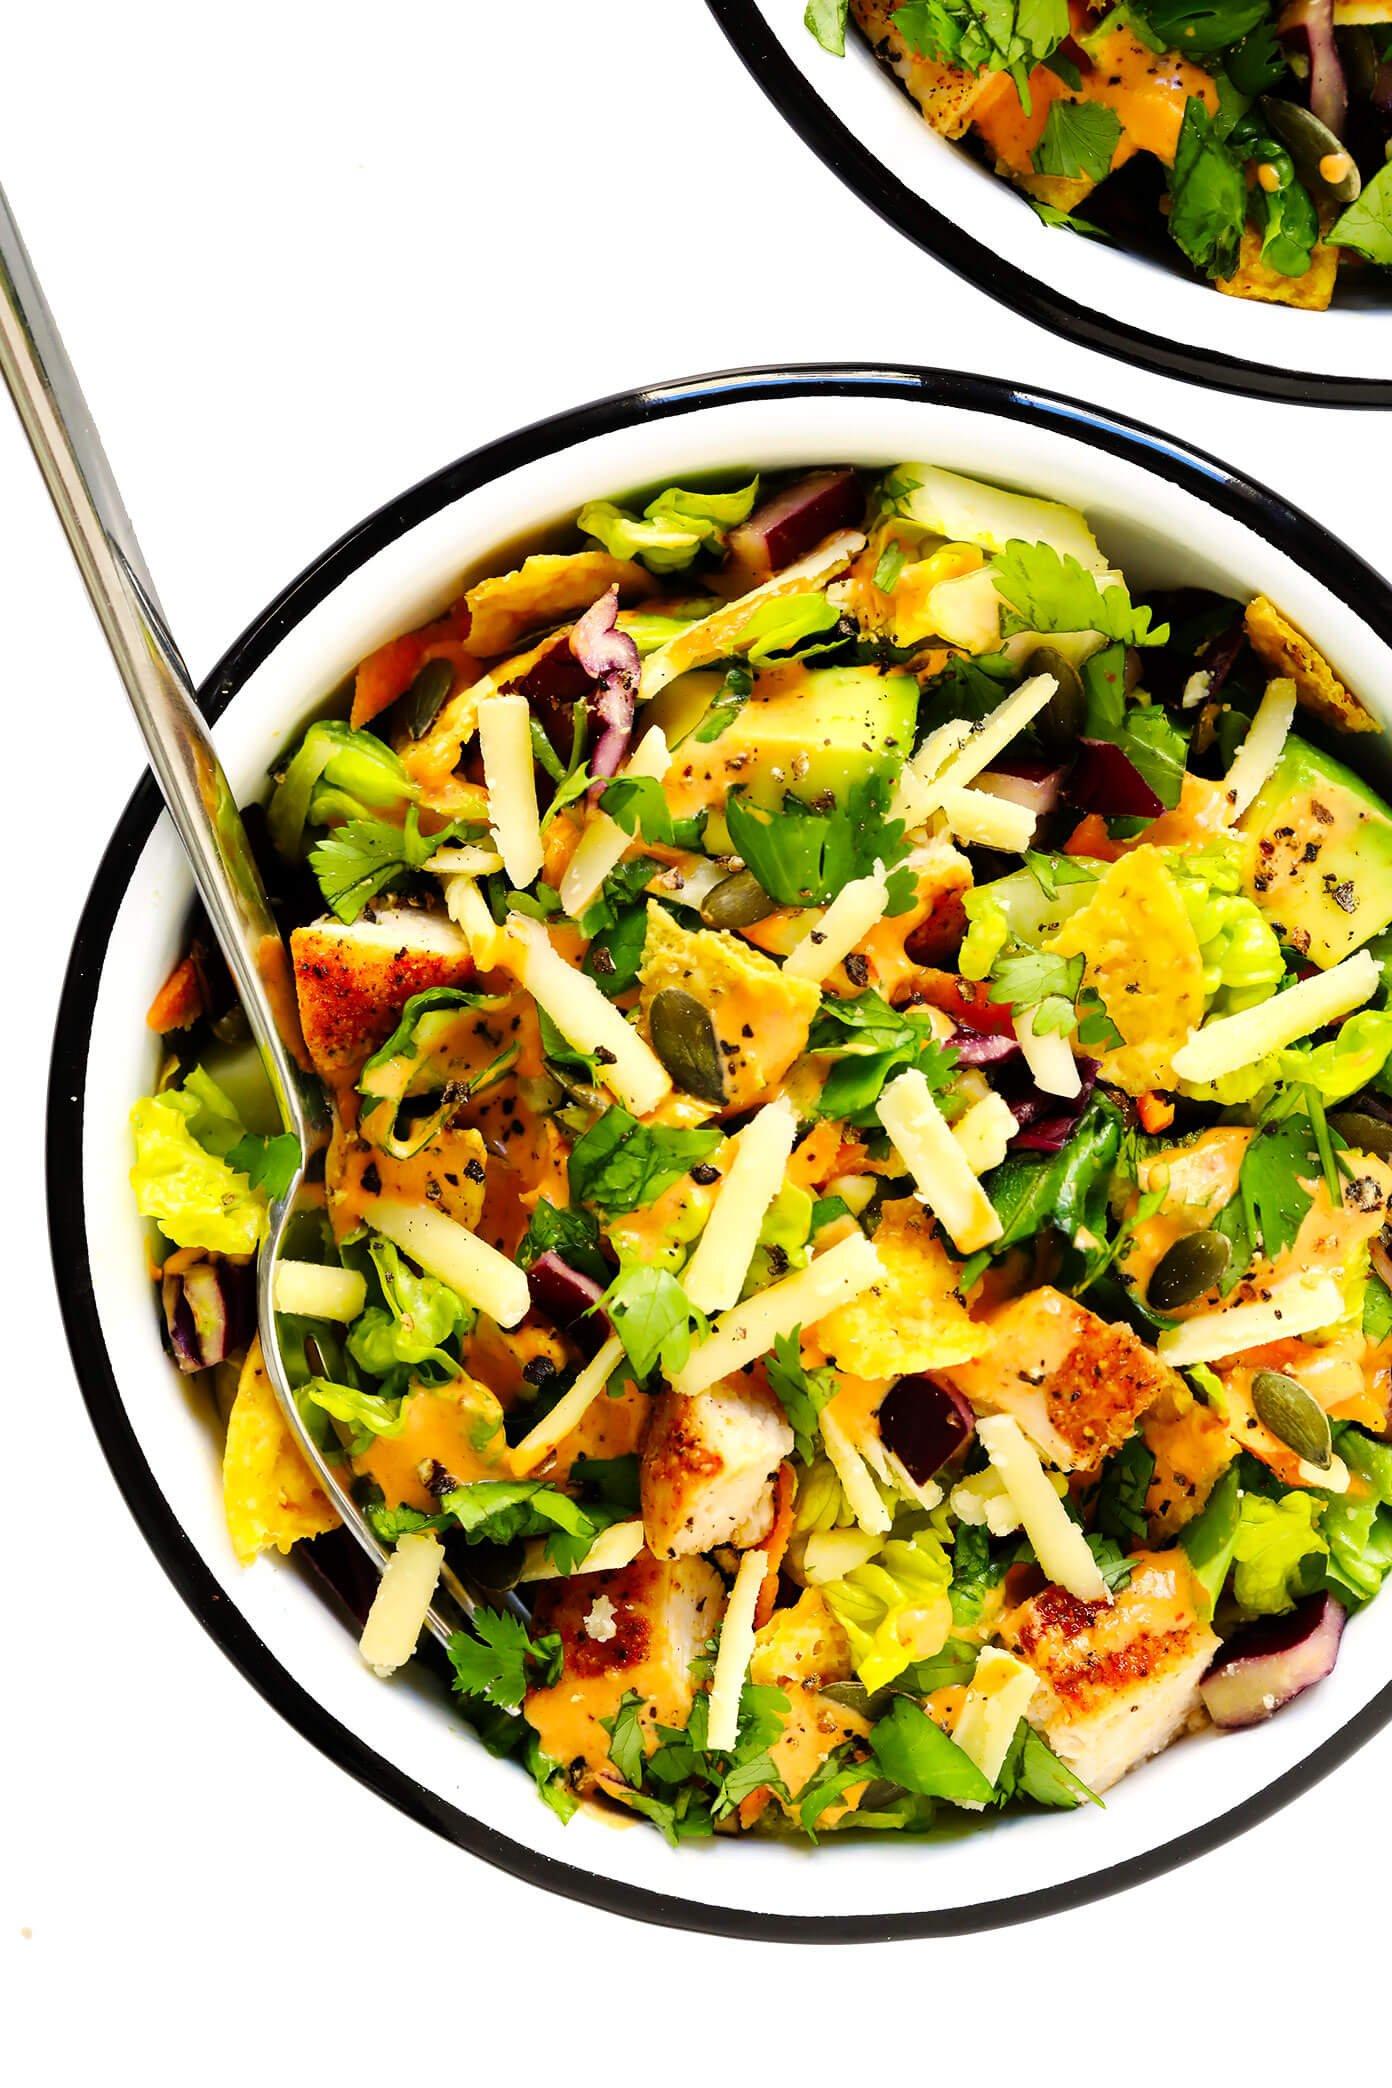 Chipotle Salad in Serving Bowls